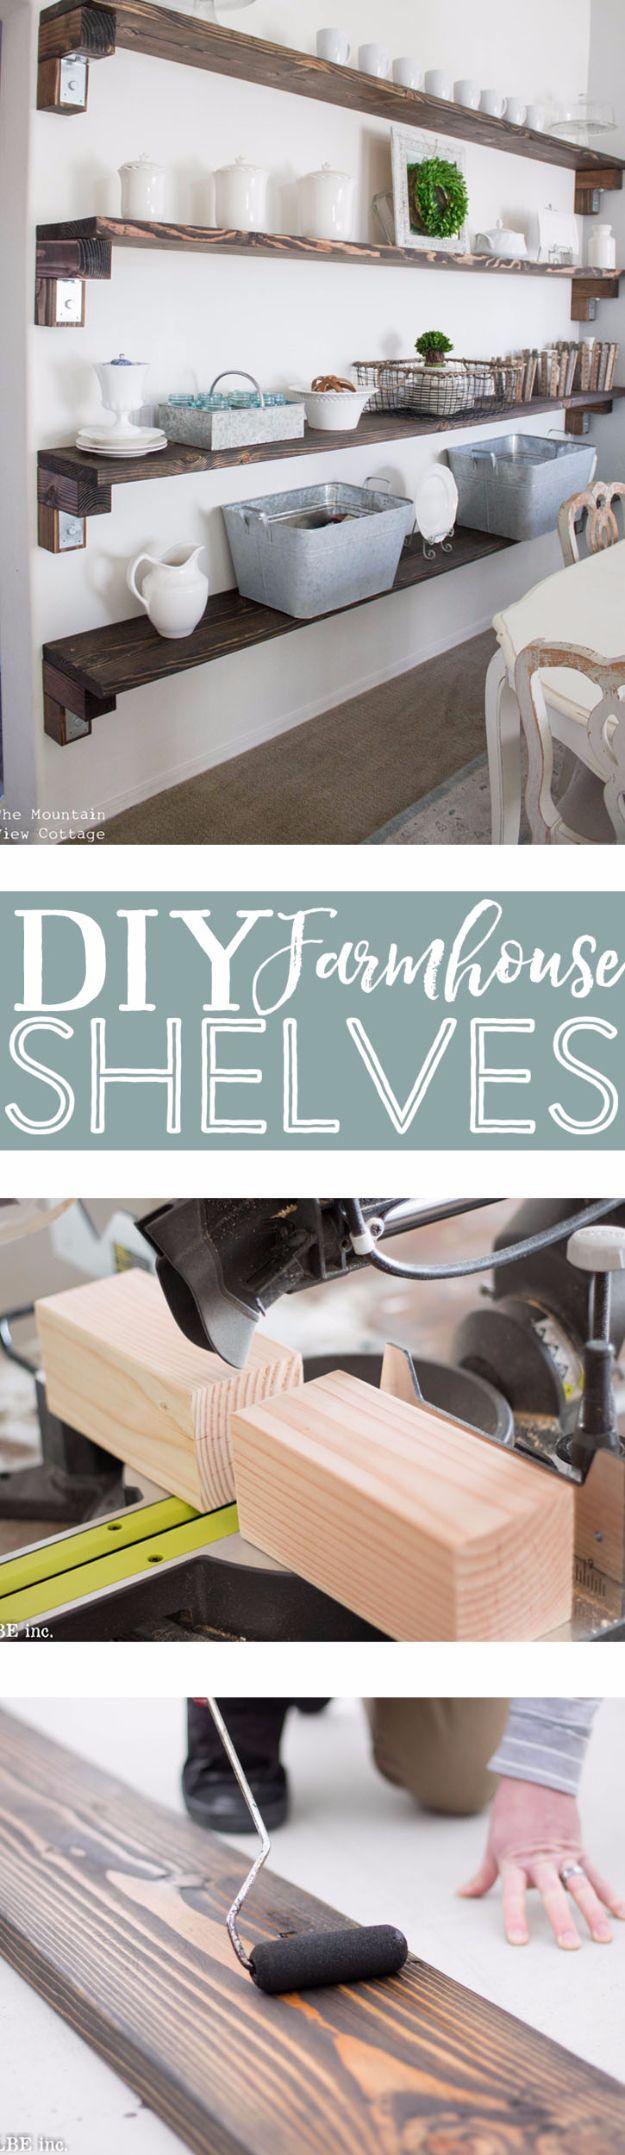 Diy Farmhouse Shelves 5 - Spectacular DIY Farmhouse Shelves